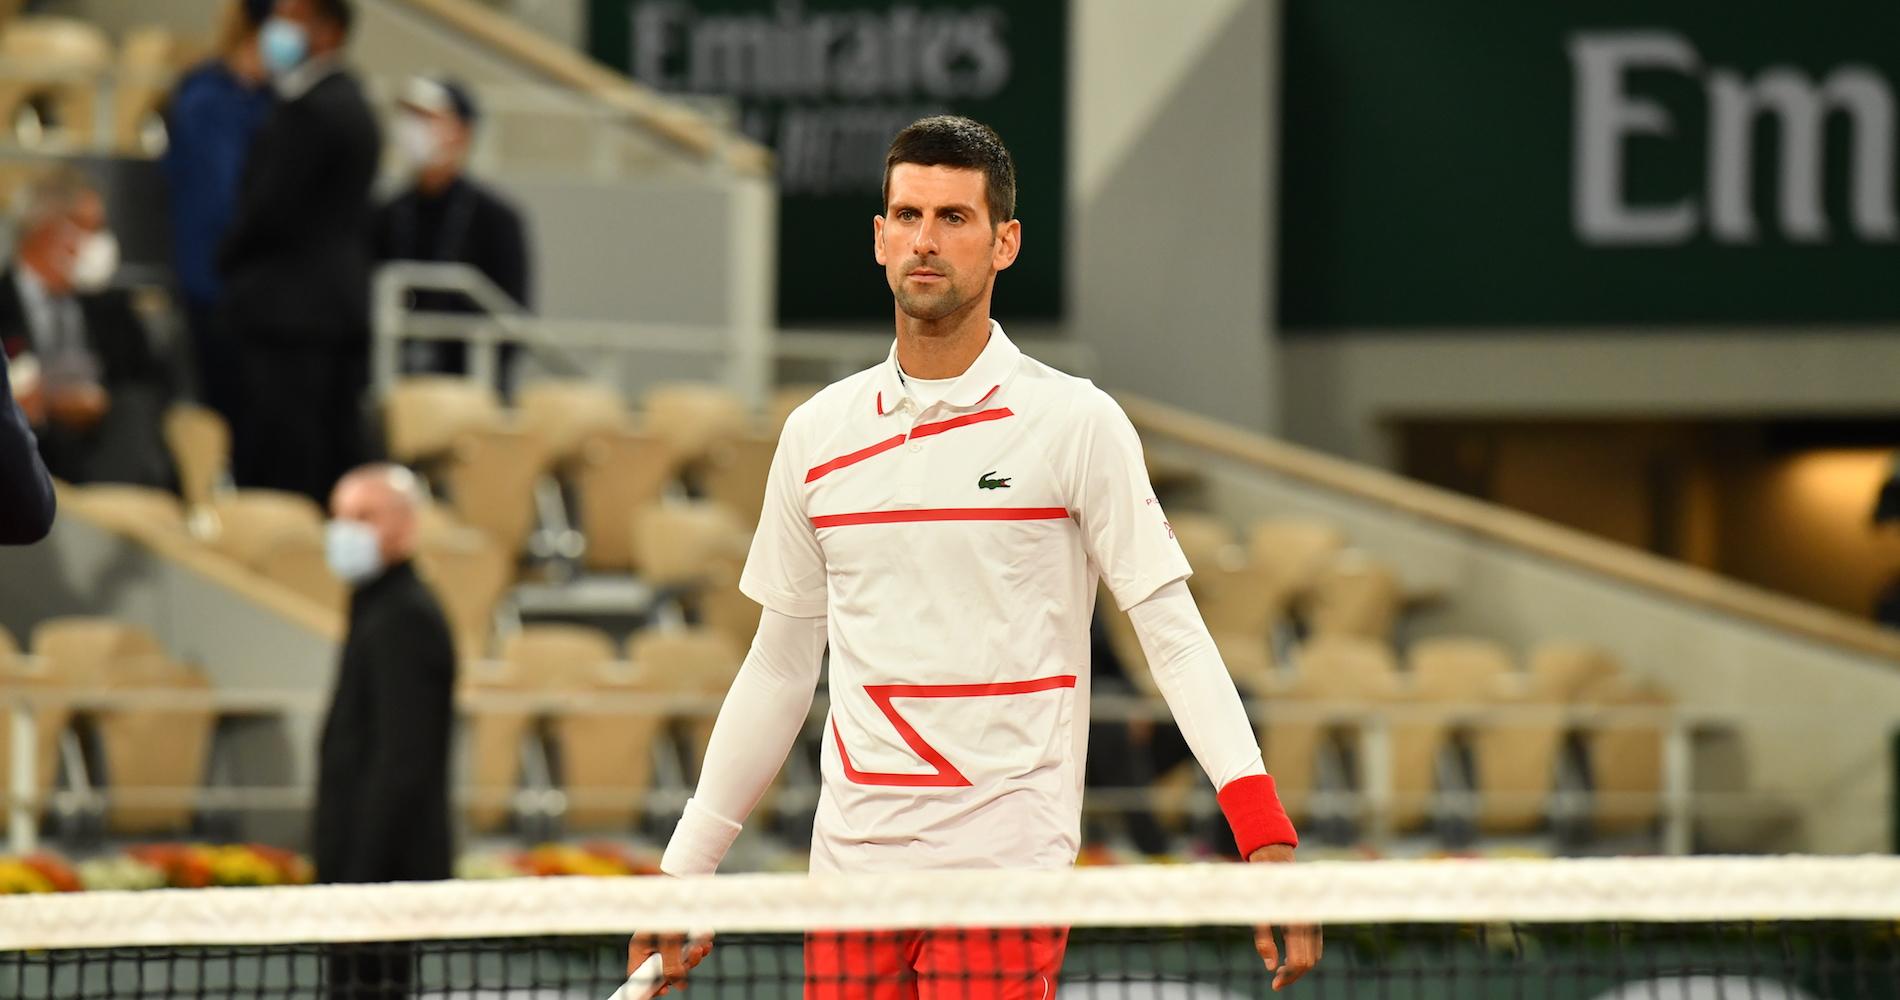 Tennis - Roland Garros 2020 - Novak Djokovic - Serbie - 29/09/2020